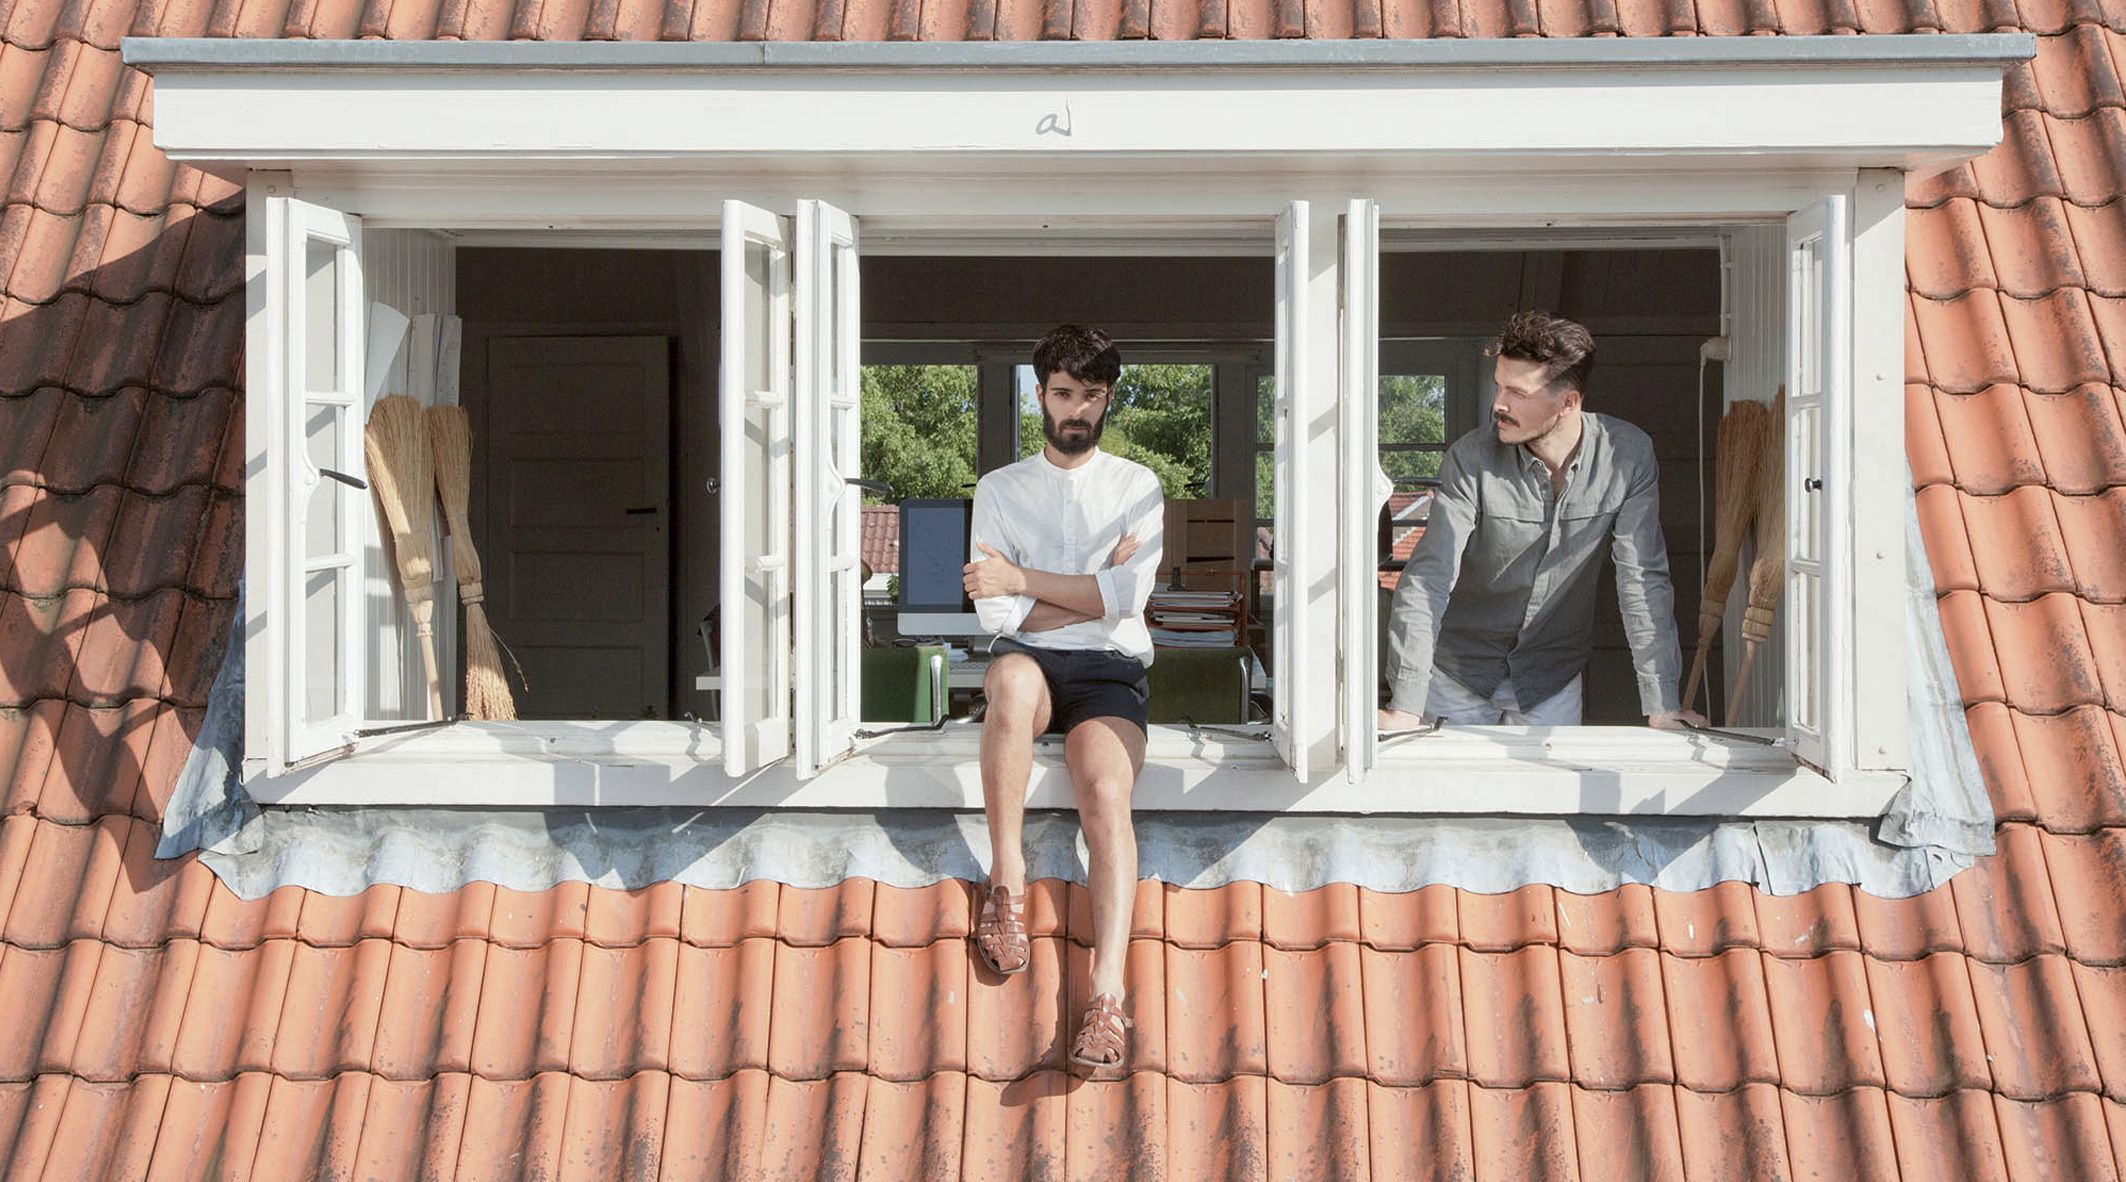 A MODO NOSTRO   L'Officiel  Interview with Formafantasma, the collective name of designers Andrea Trimarchi e Simone Farresin.